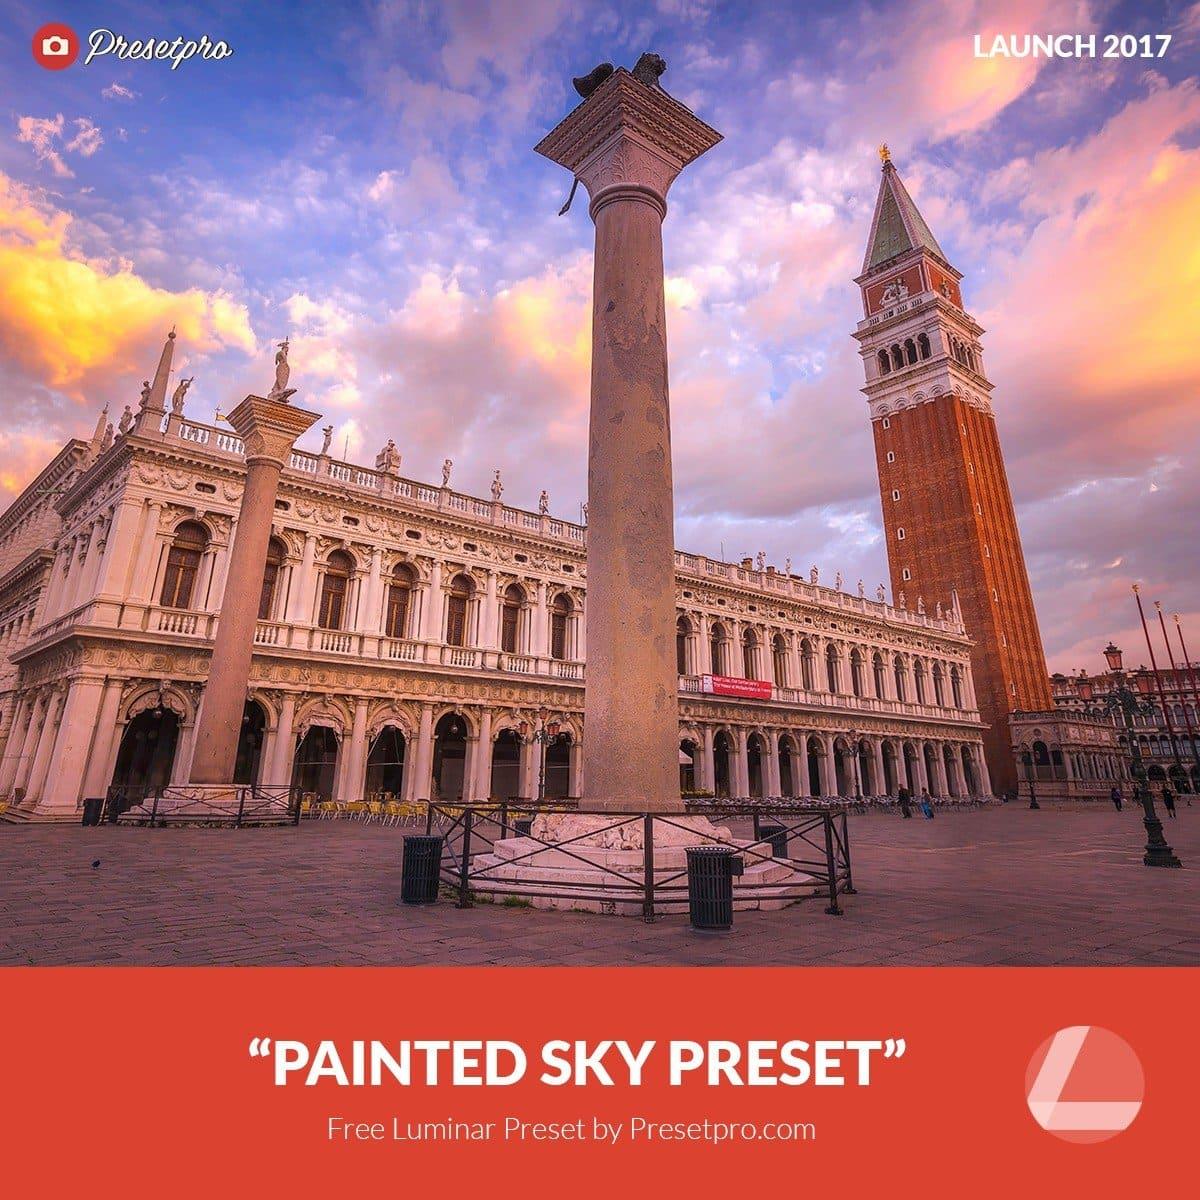 Free-Luminar-Preset-Painted-Sky